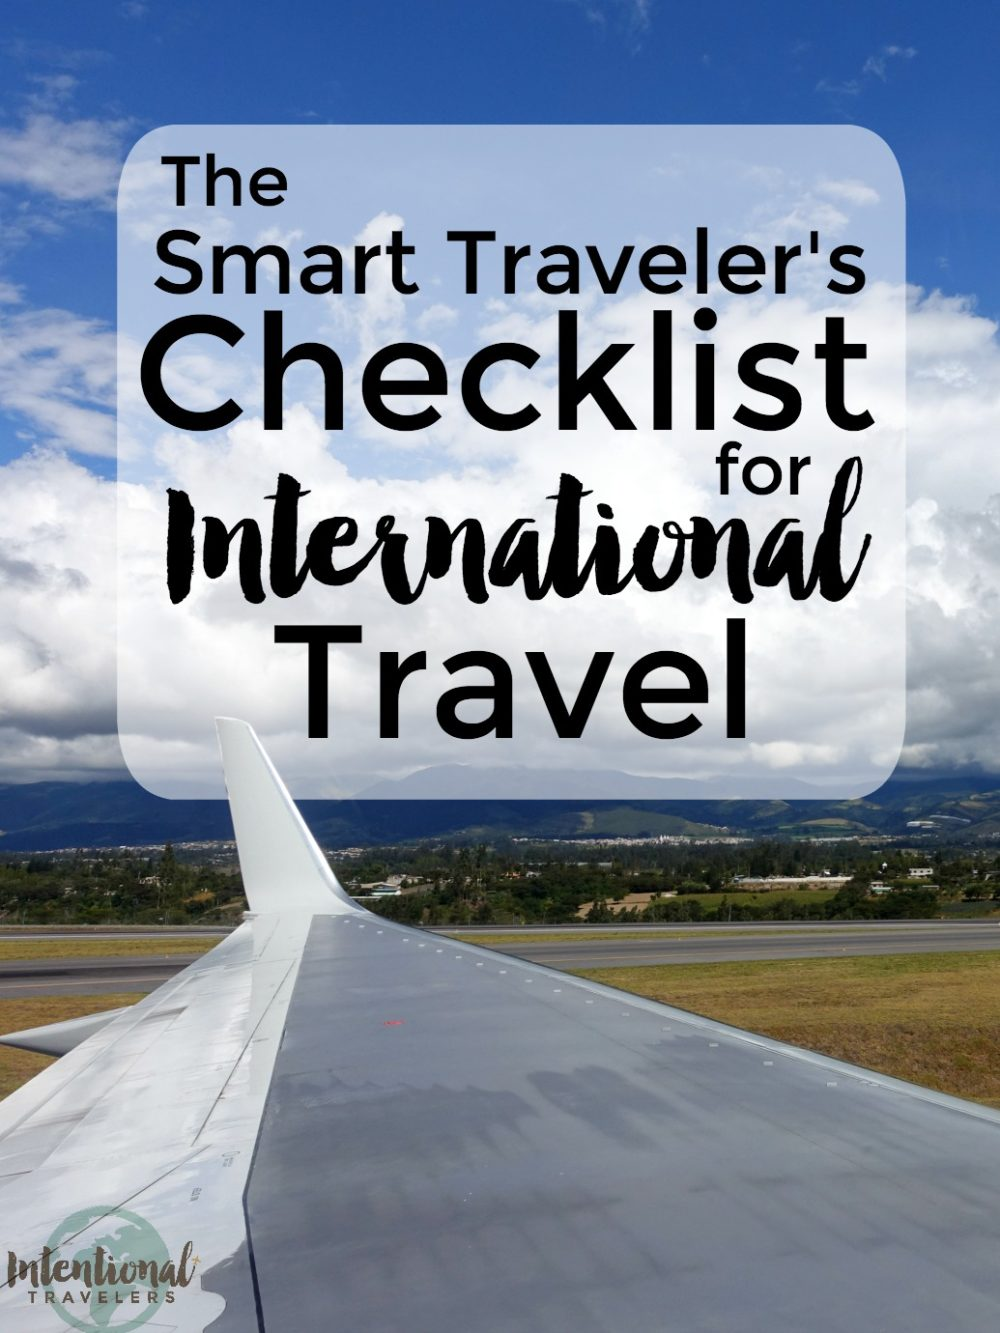 Checklist-international-travel